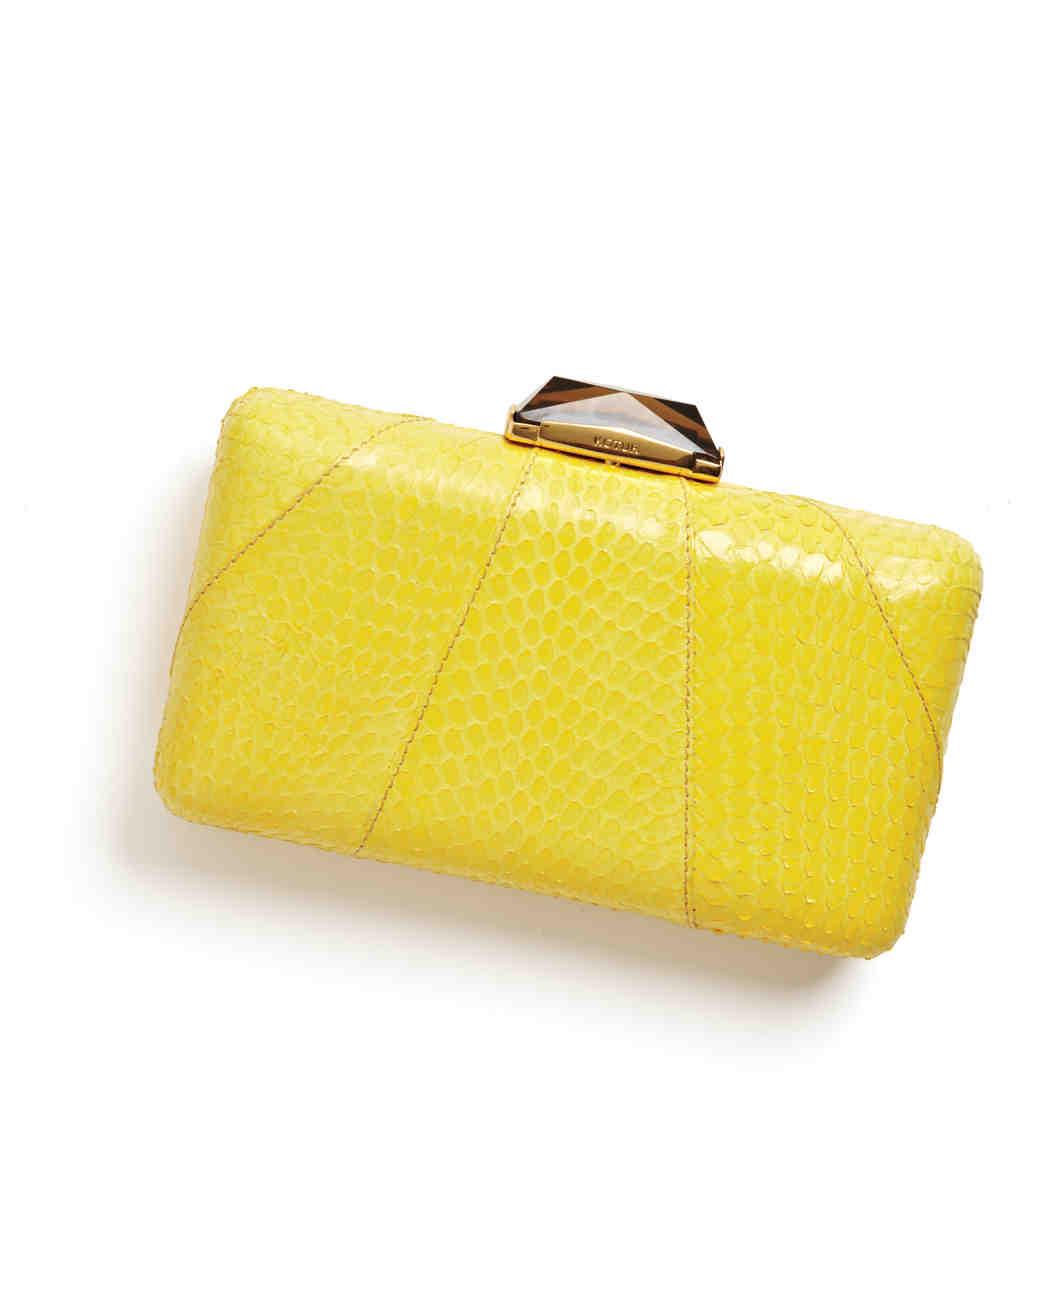 yellow-clutch-mwd108181.jpg